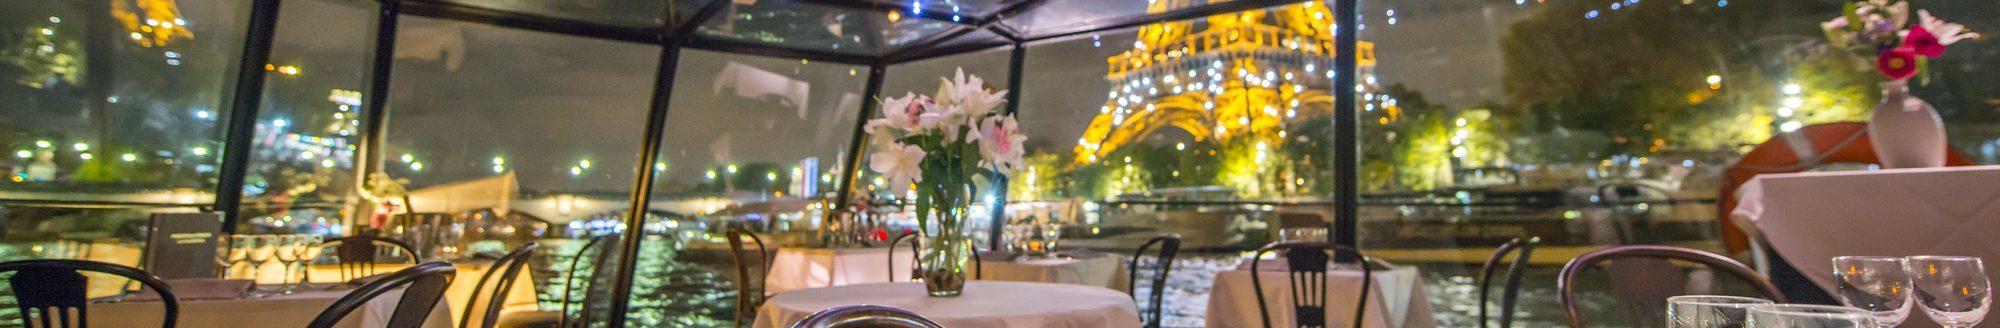 Photos Marina de Paris - Nouvel An 2020